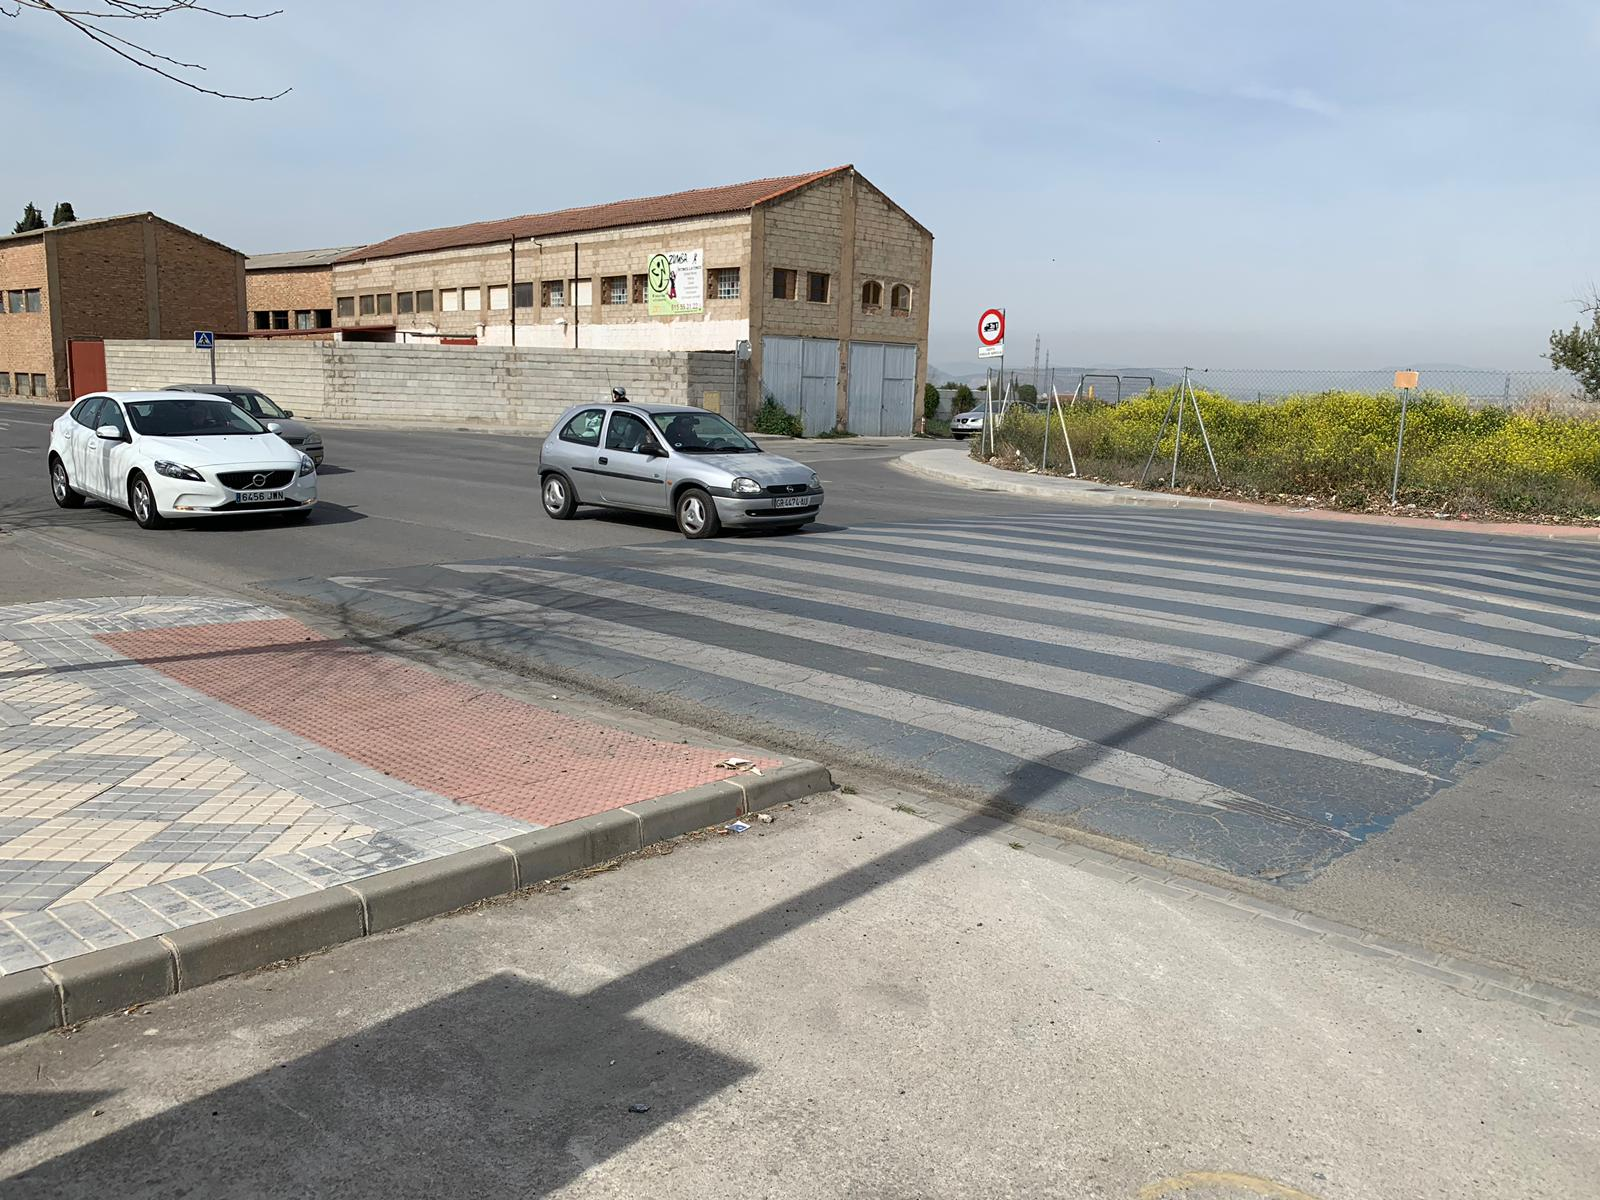 Churriana tendrá su rotonda en la Avenida Cristóbal Colón